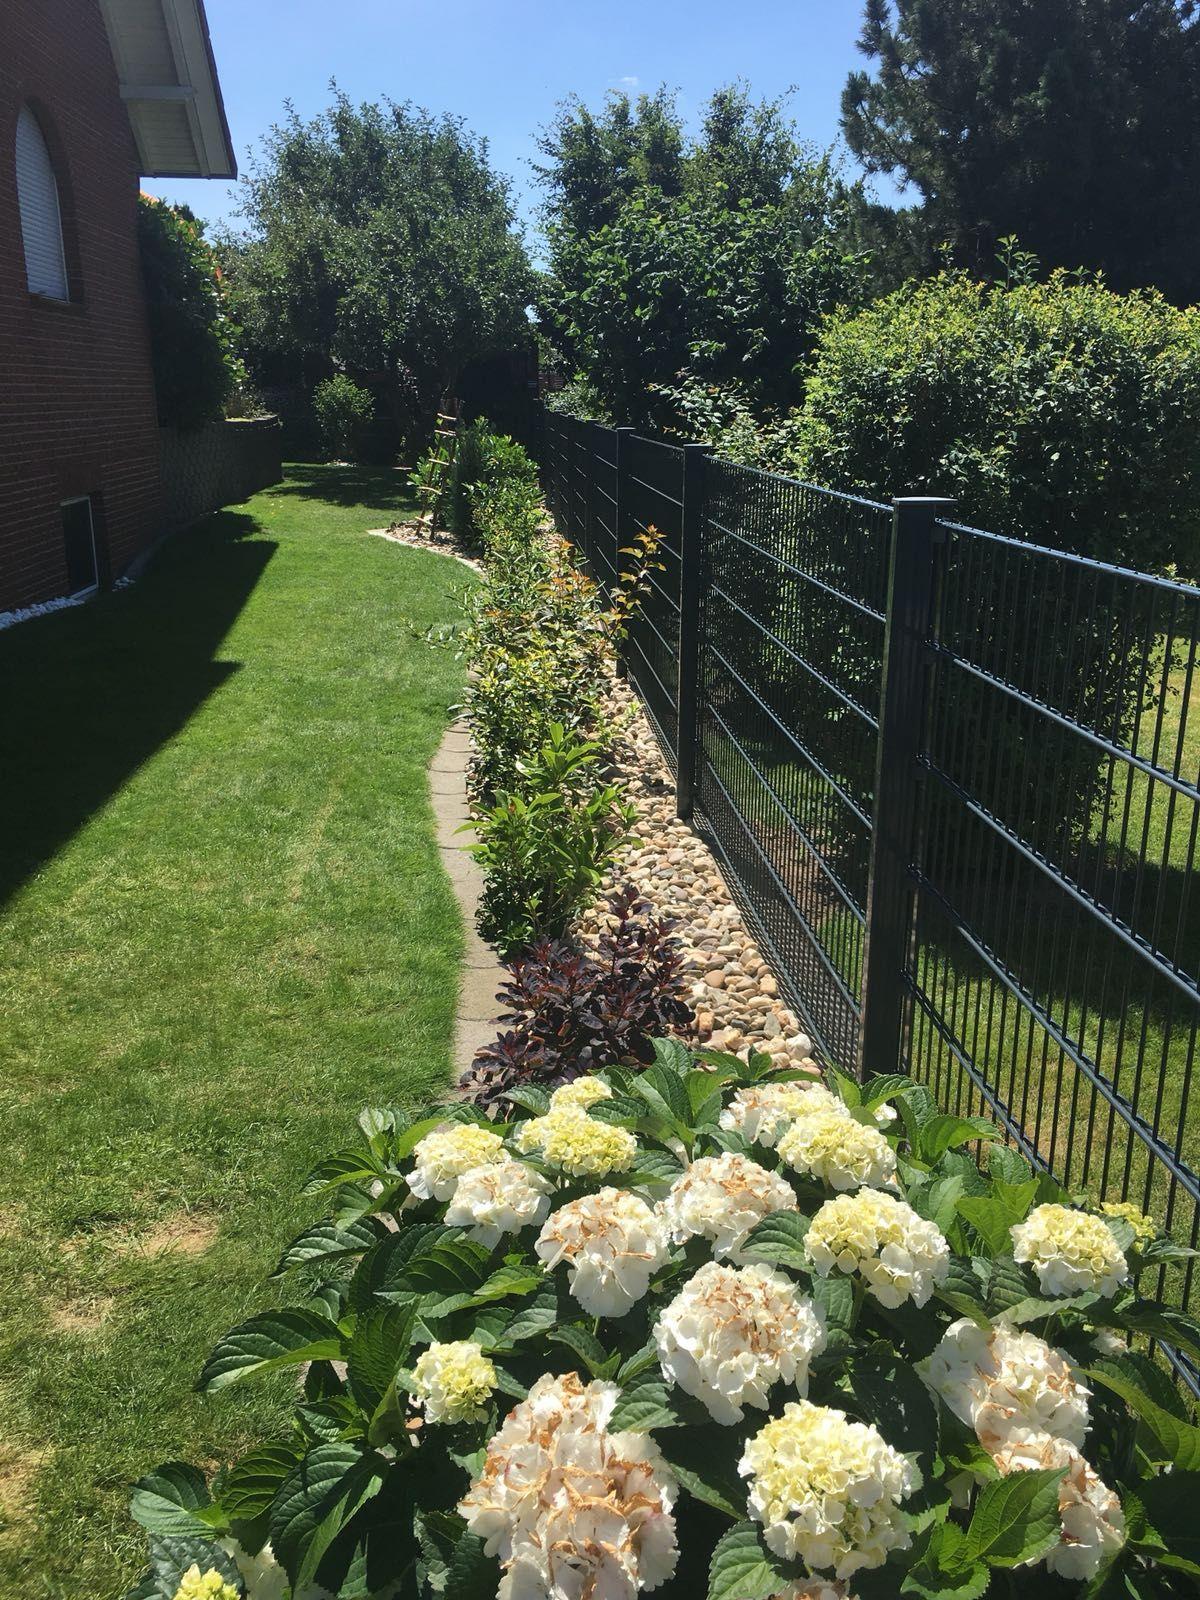 Lyqqurbjwqrcxkcxoalpmavuoqnfezevuuhnhjkeueccqwtwql Garden Fence Backyard Garden Layout Garden Layout